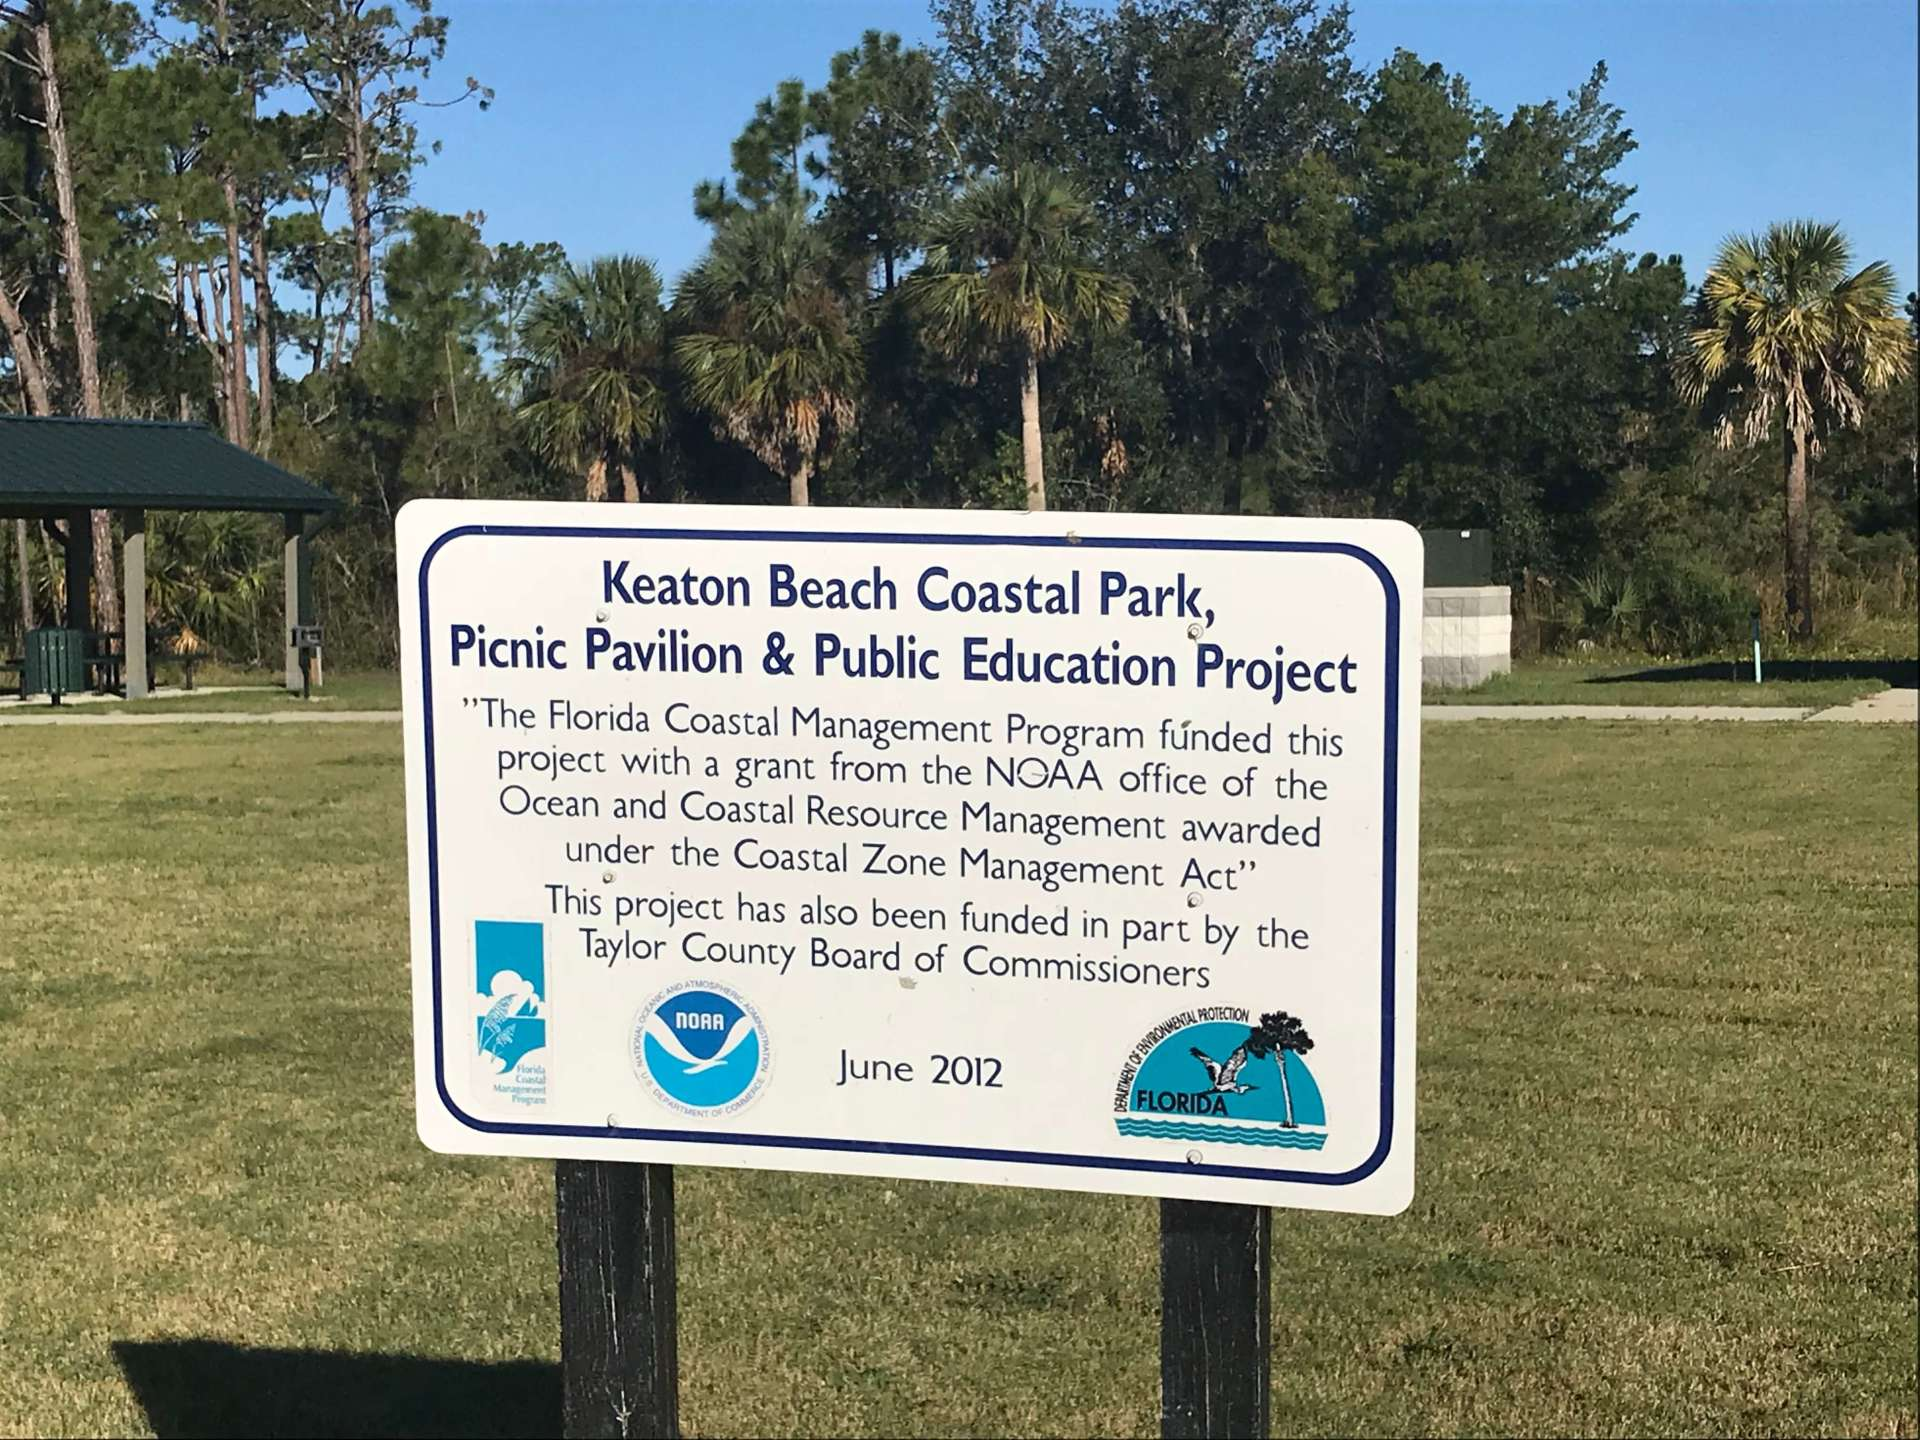 Keaton Beach coastal park